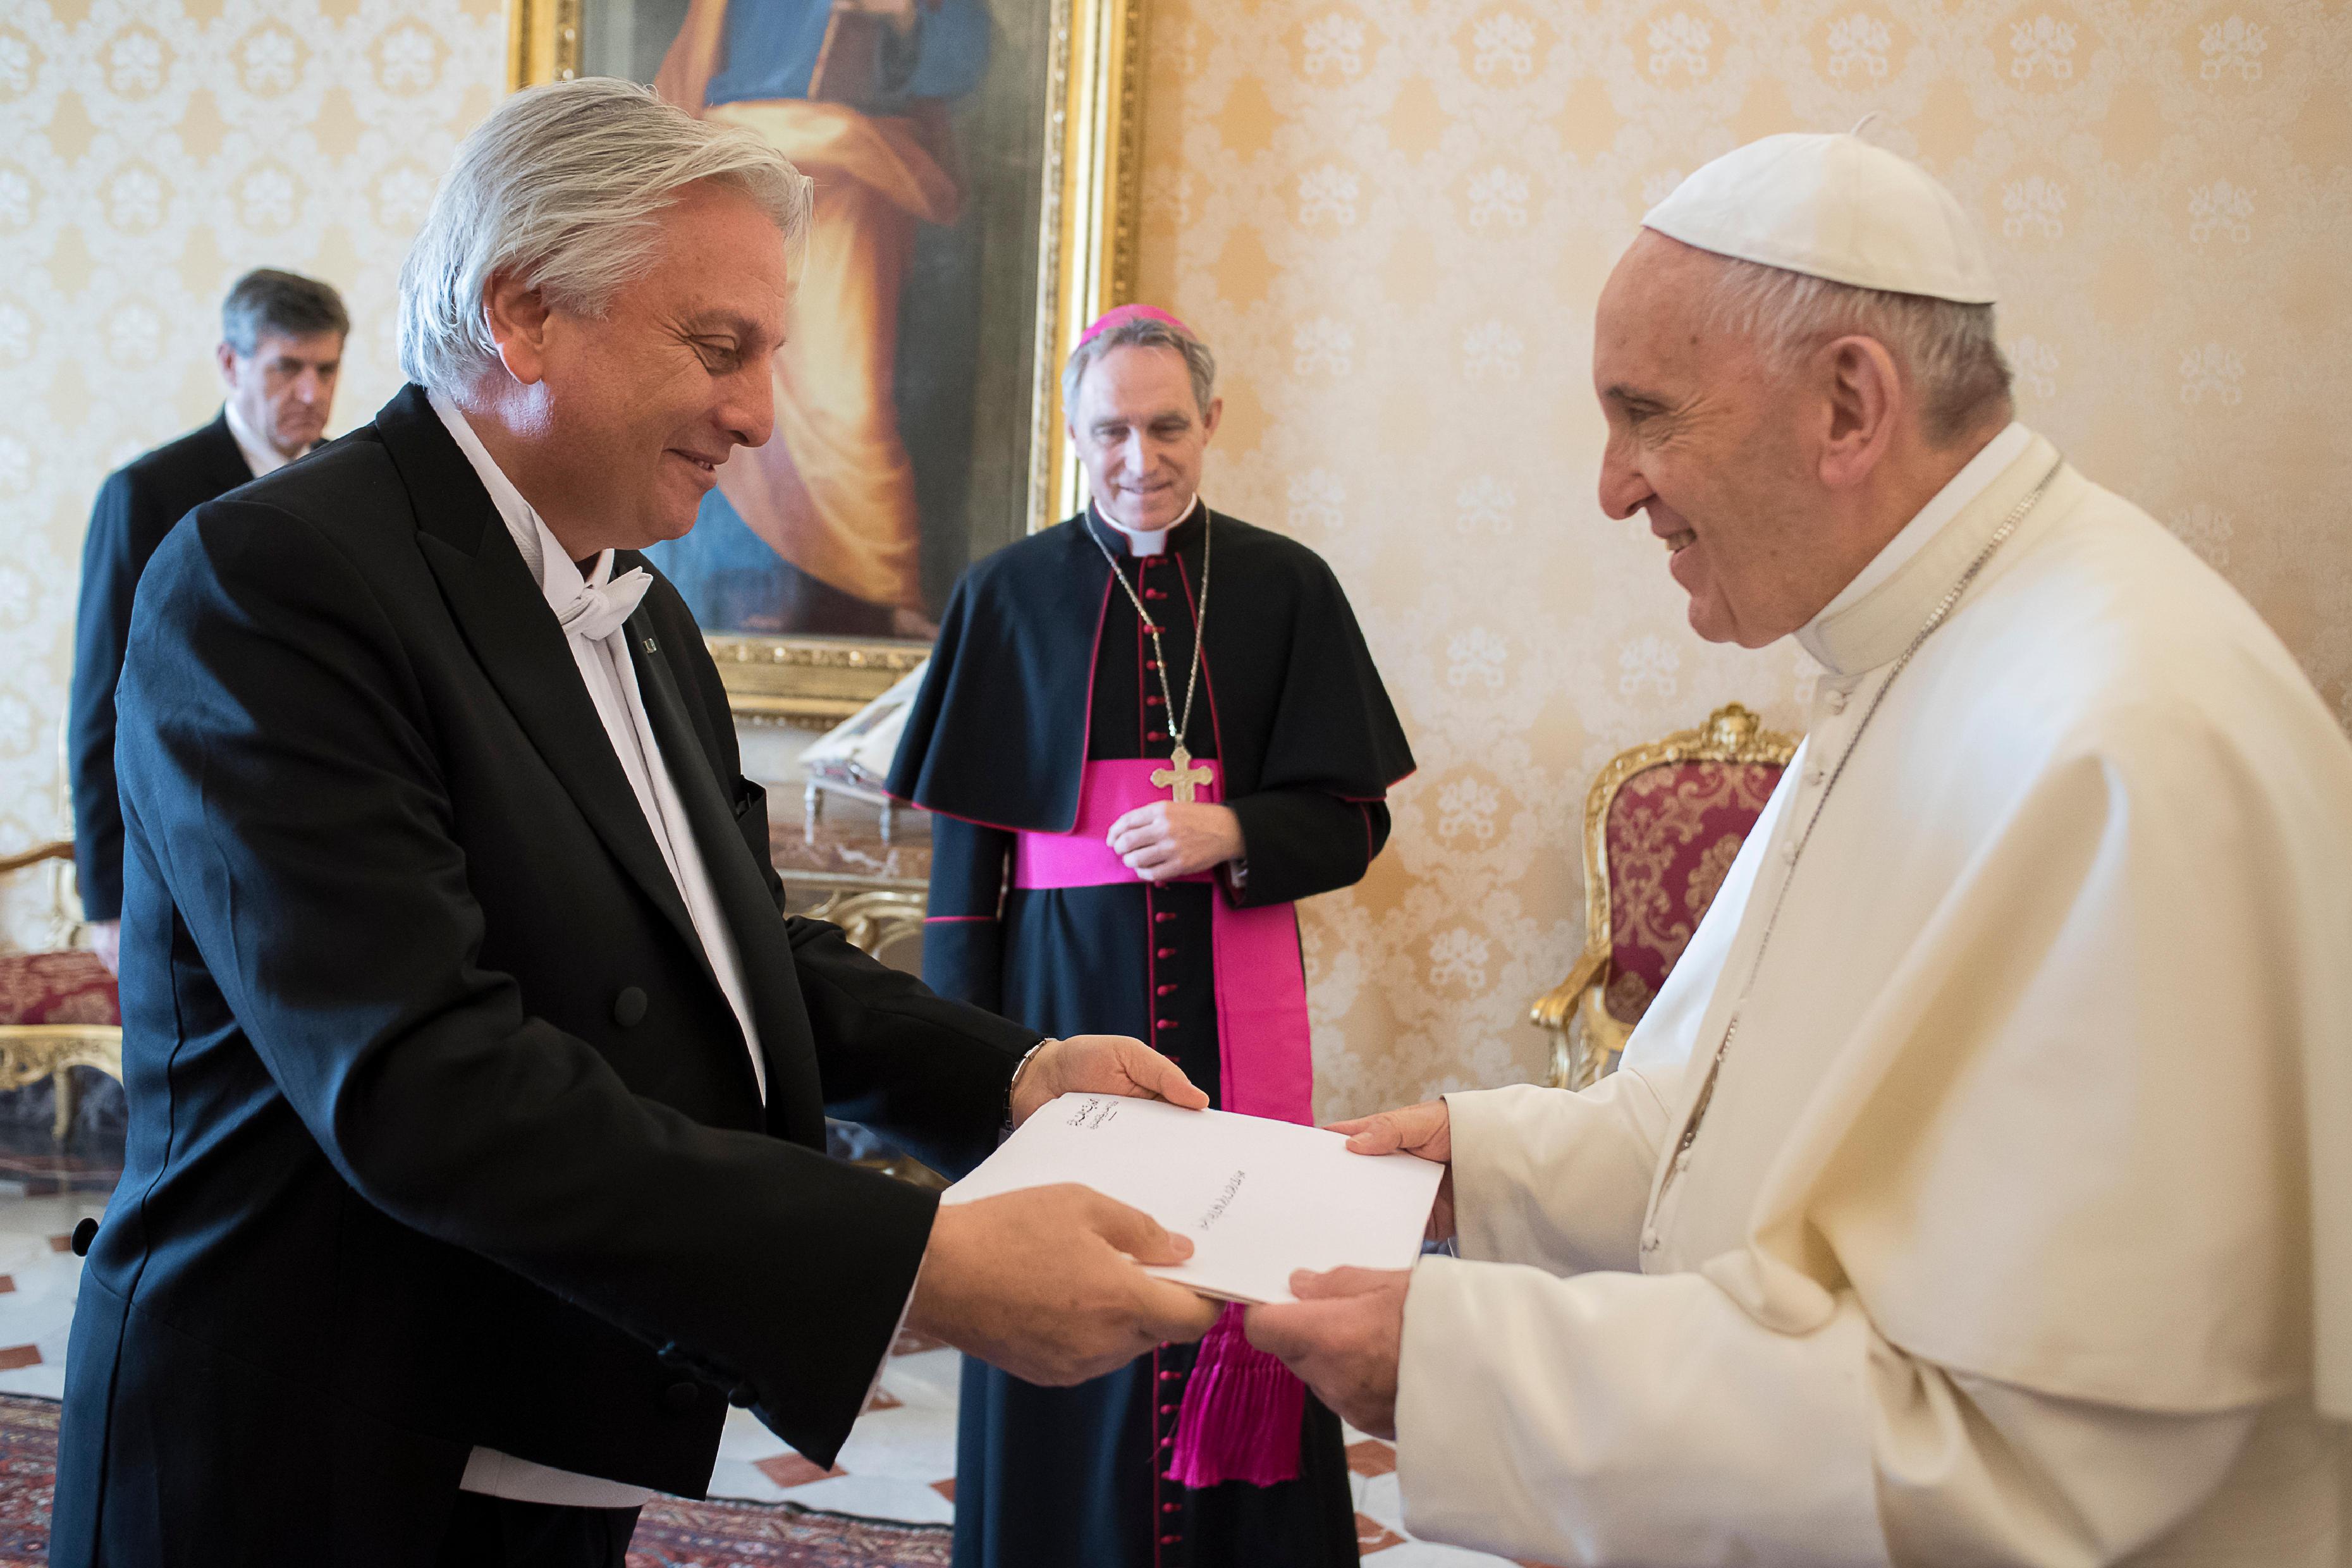 Antonio Raymond Andary ambassadeur du Liban © L'Osservatore Romano